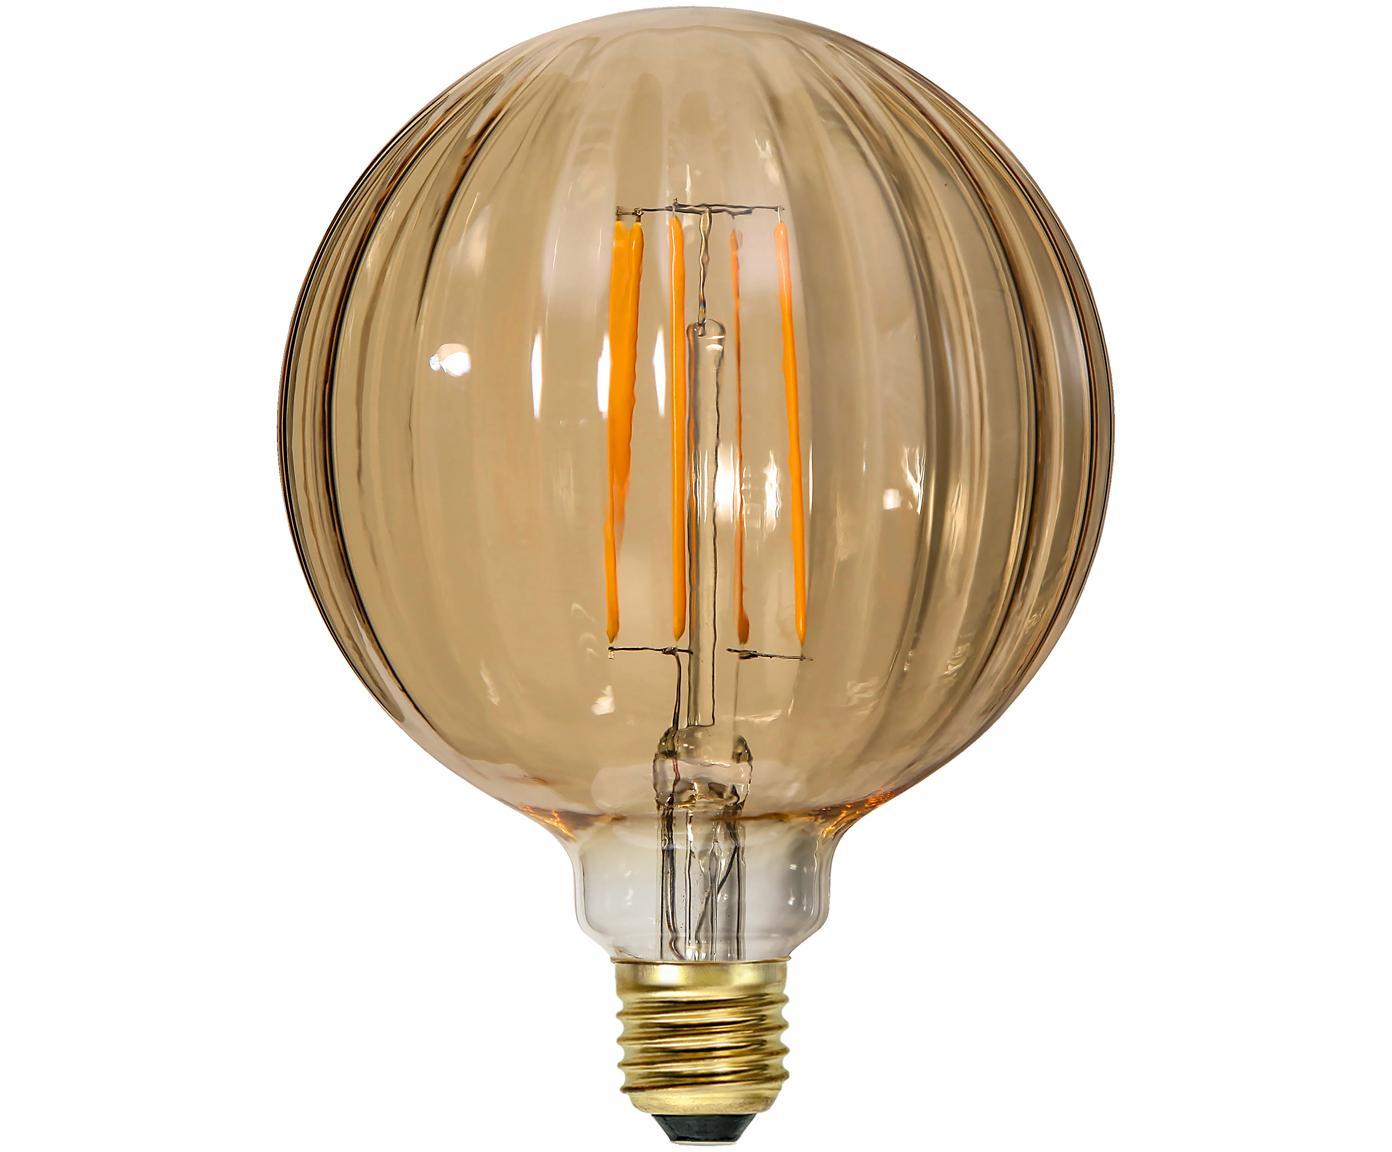 Lampadina a LED Circy (E27 / 3Watt), Paralume: vetro, Base lampadina: nichel, Ambra, Ø 13 x Alt. 17 cm